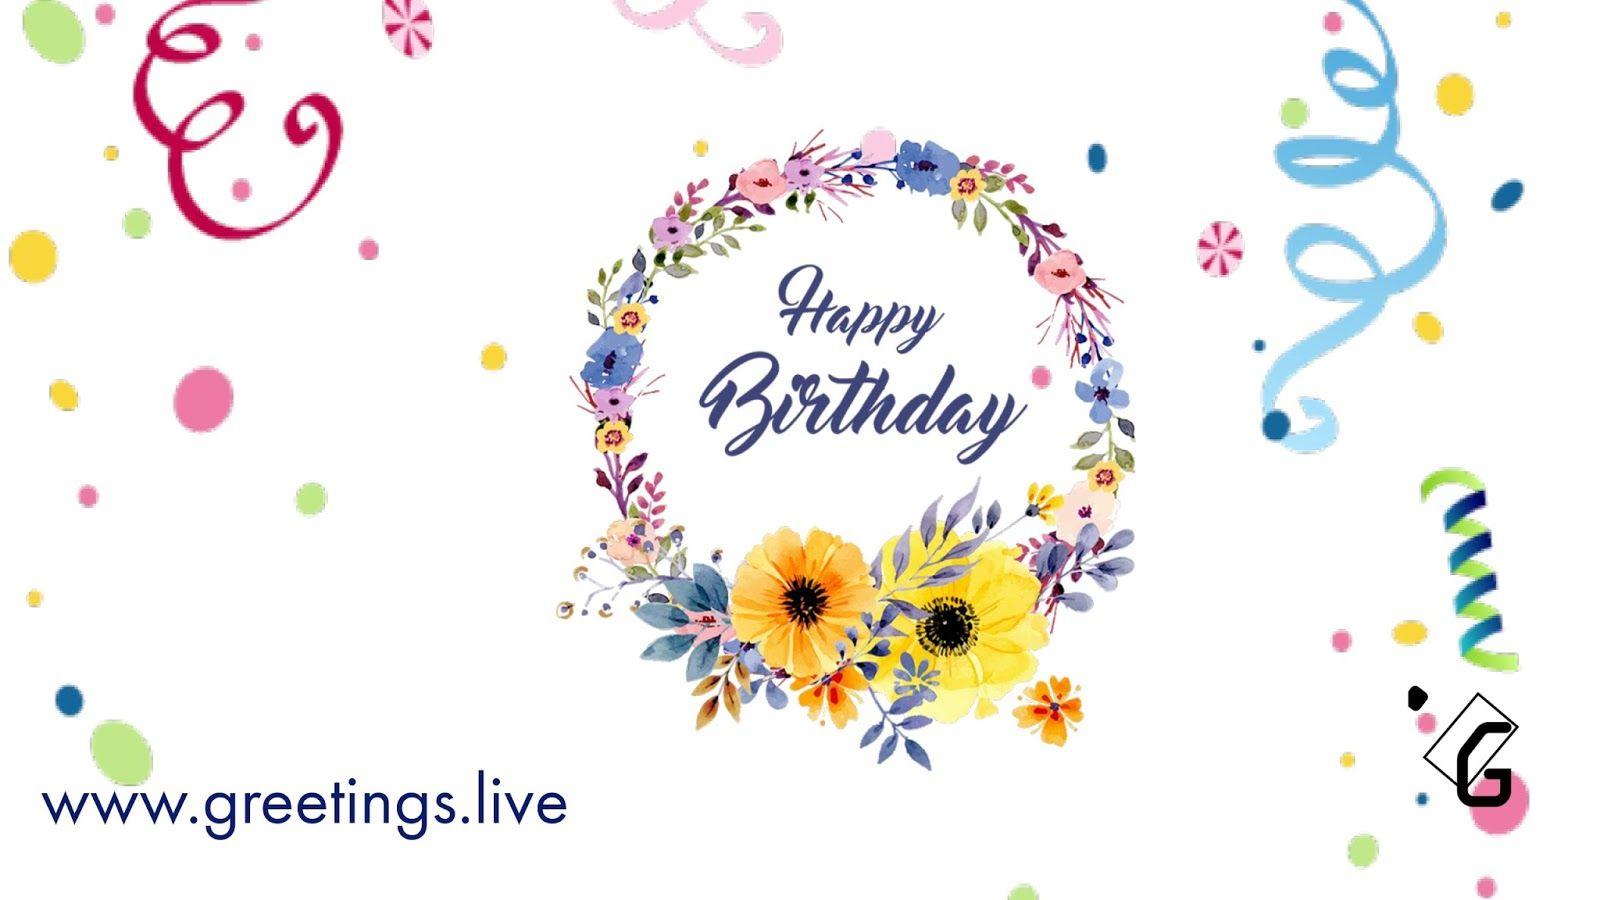 Greetings Live Sweet Happy Birthday Messagesee Birthday Greetings